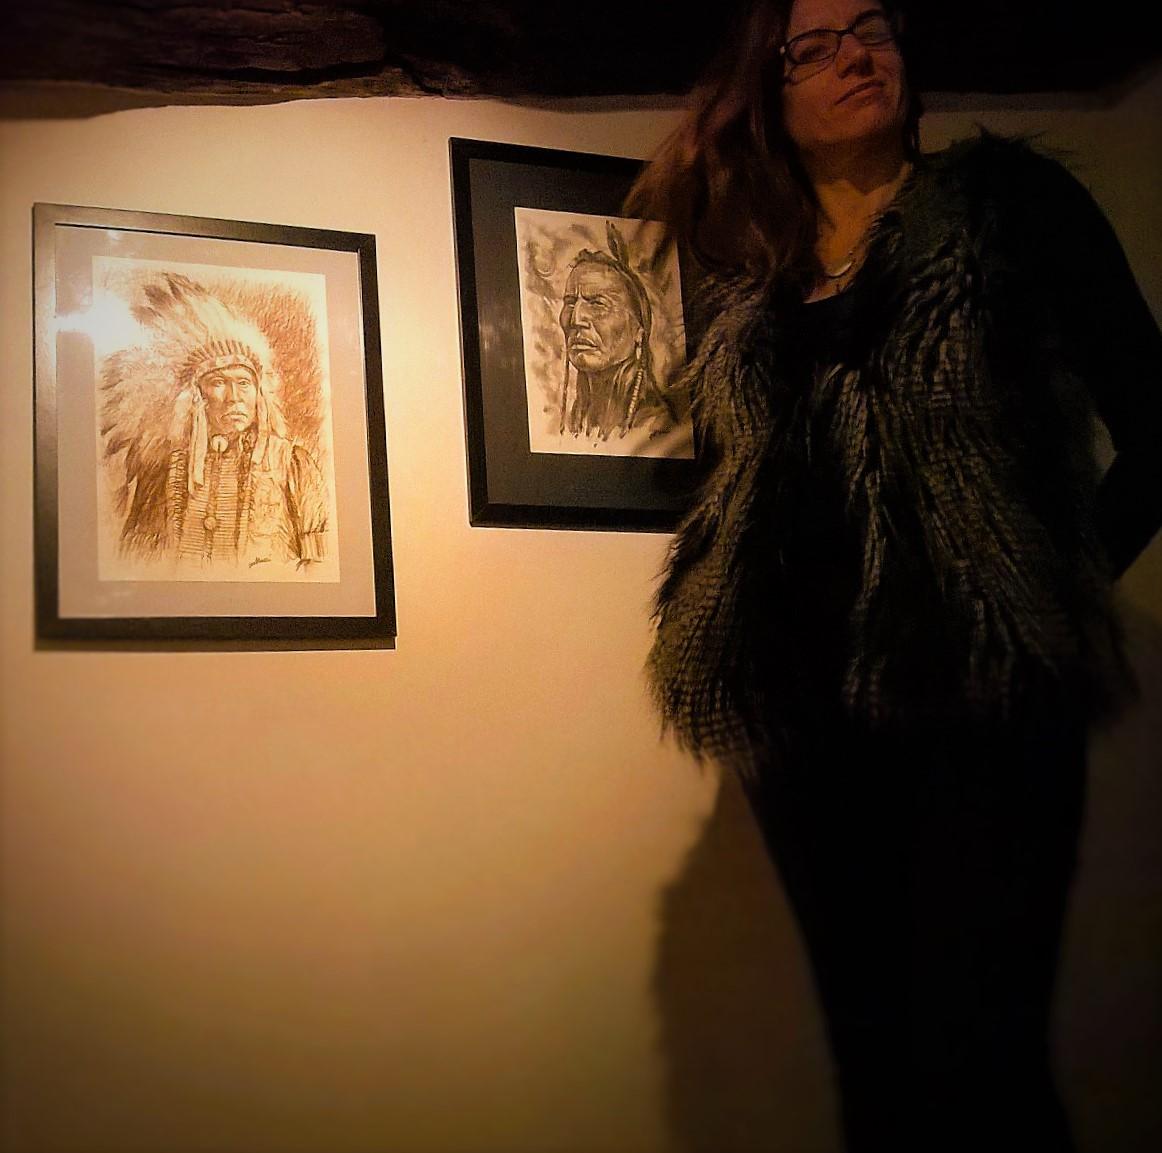 laura-guadagnucci-nativi-americani-livin_art-lucca-pollacci